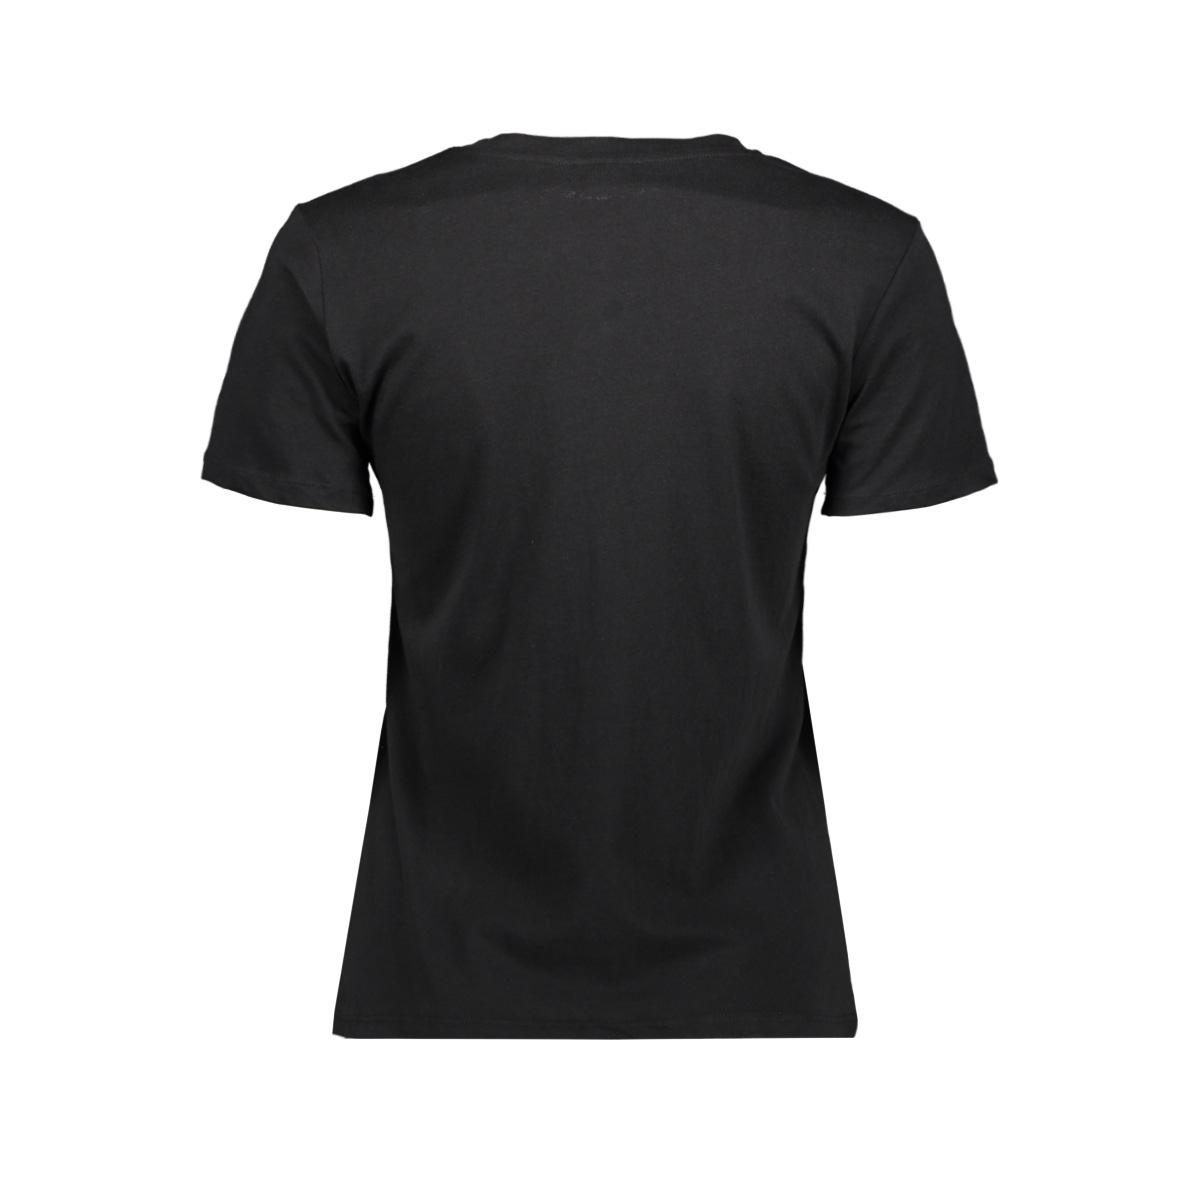 jdydiana life print top jrs 15204478 jacqueline de yong t-shirt black/red orhre